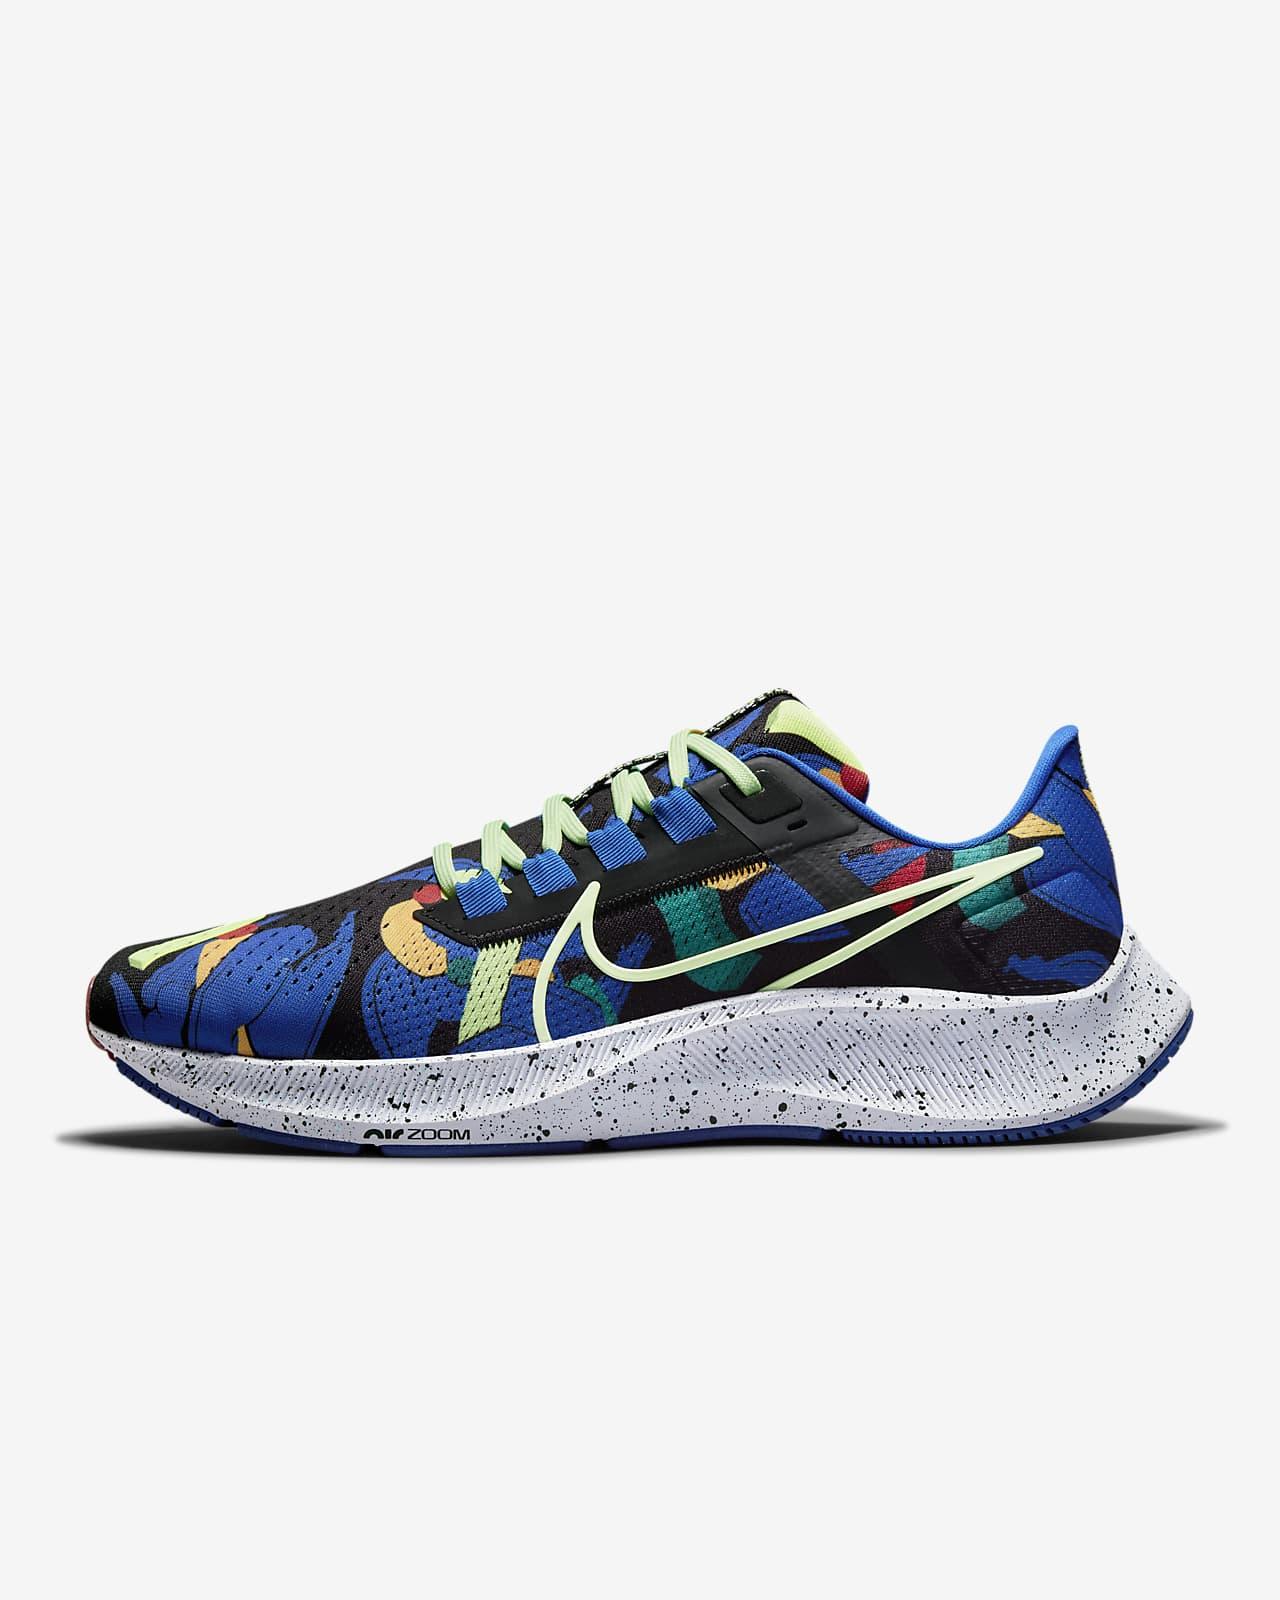 Nike Air Zoom Pegasus 38 A.I.R. Calzado de running para hombre Kelly Anna London